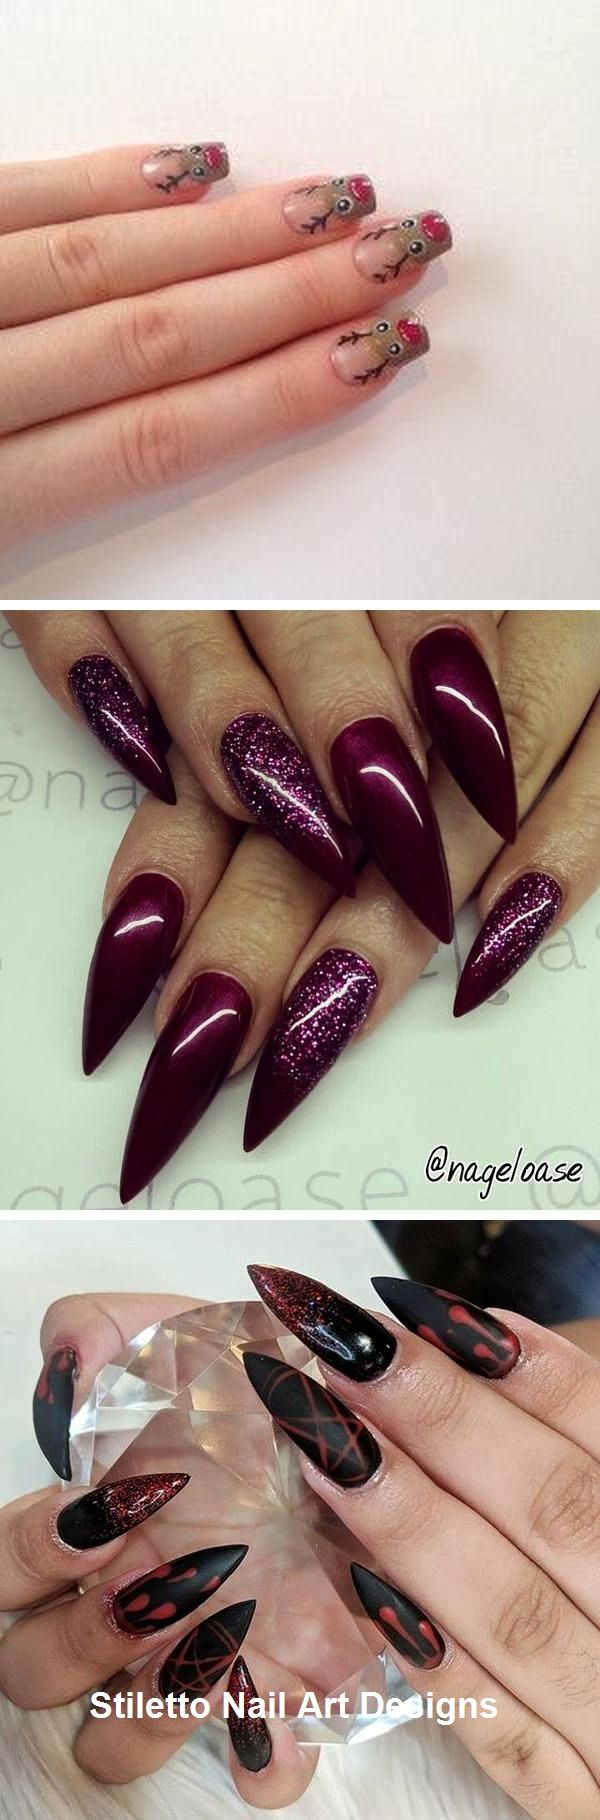 30 große Stiletto Nail Art Design-Ideen #nailart – Nails……